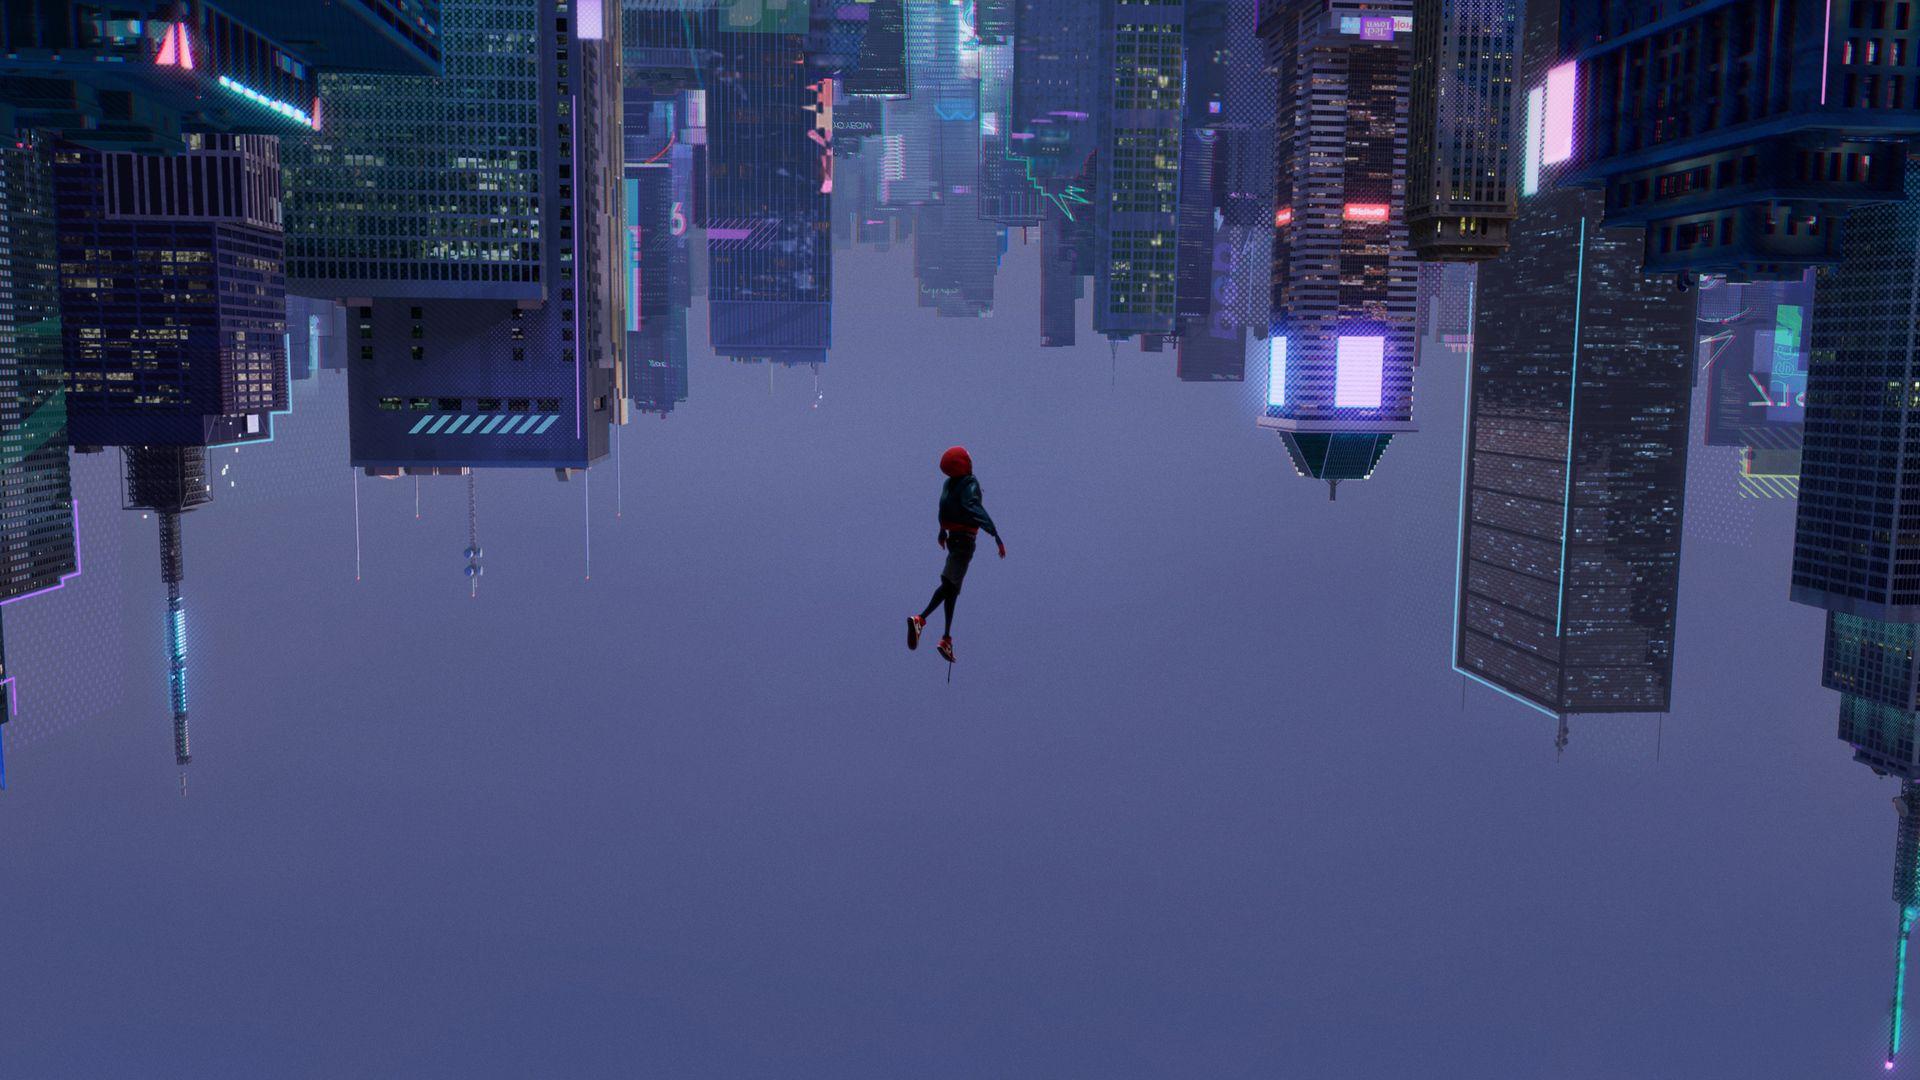 Miles morales spider man into the spider verse - Moving spider desktop ...